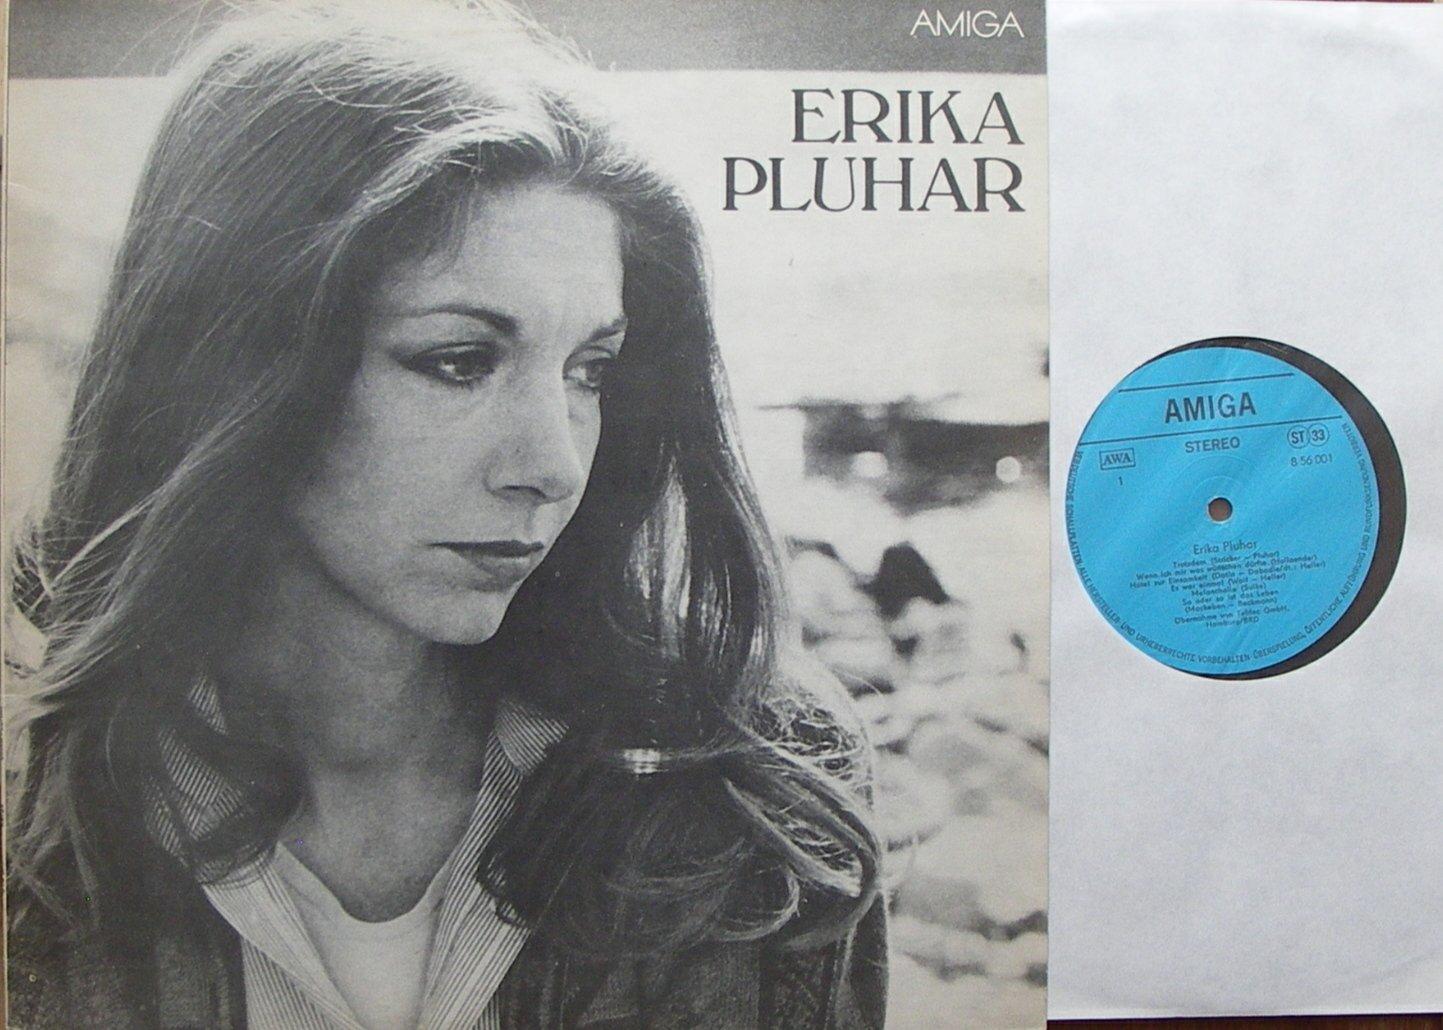 Erika Pluhar Lp Erika Pluhar Amazonde Musik